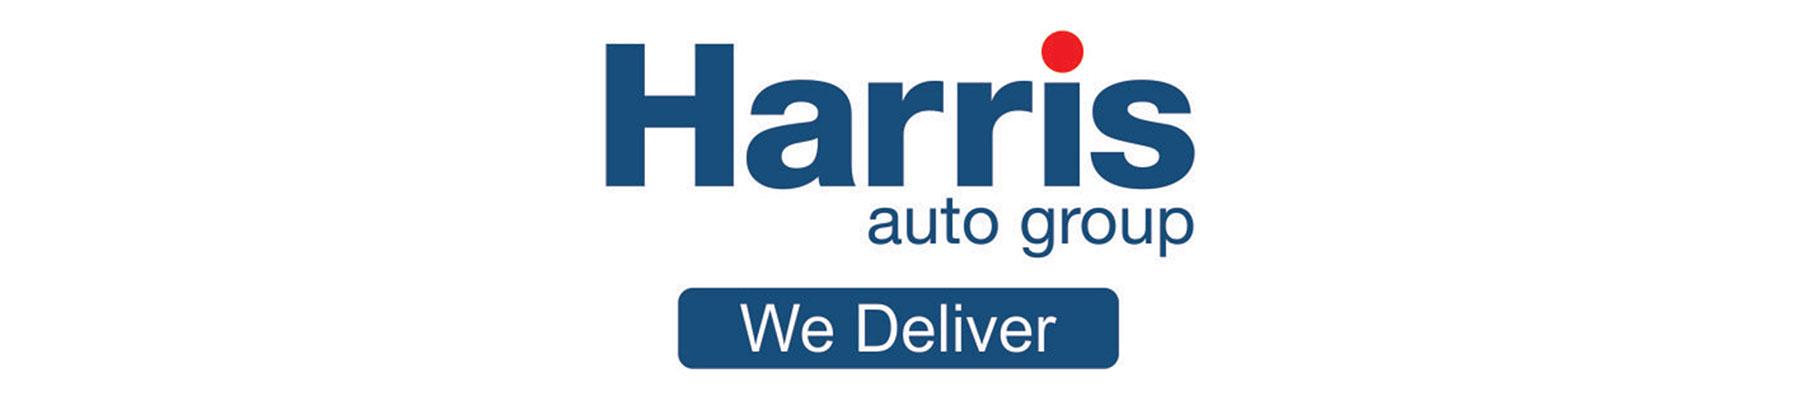 harris-banner-2